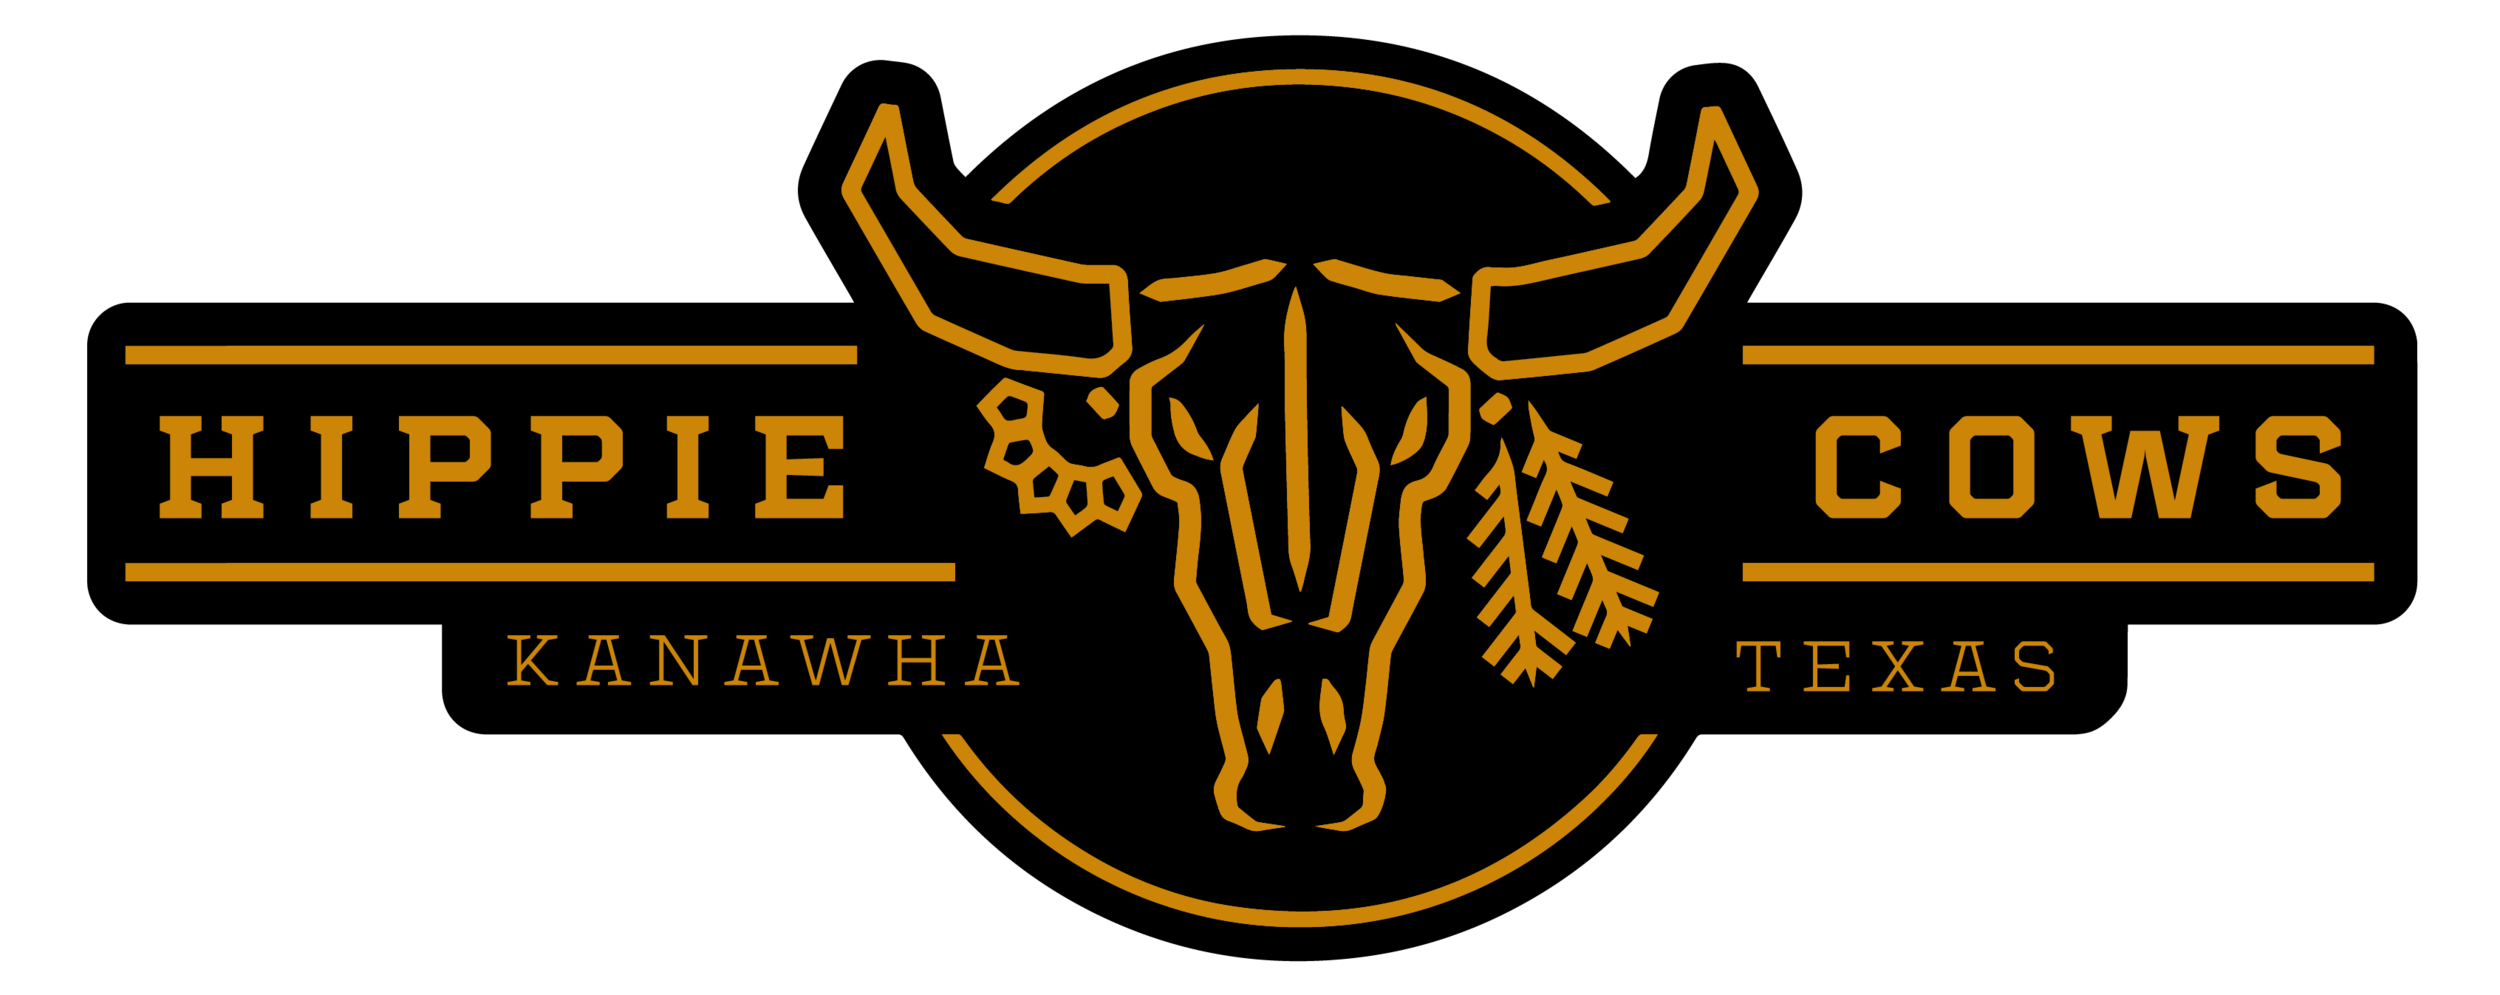 Hippie Cow Beef